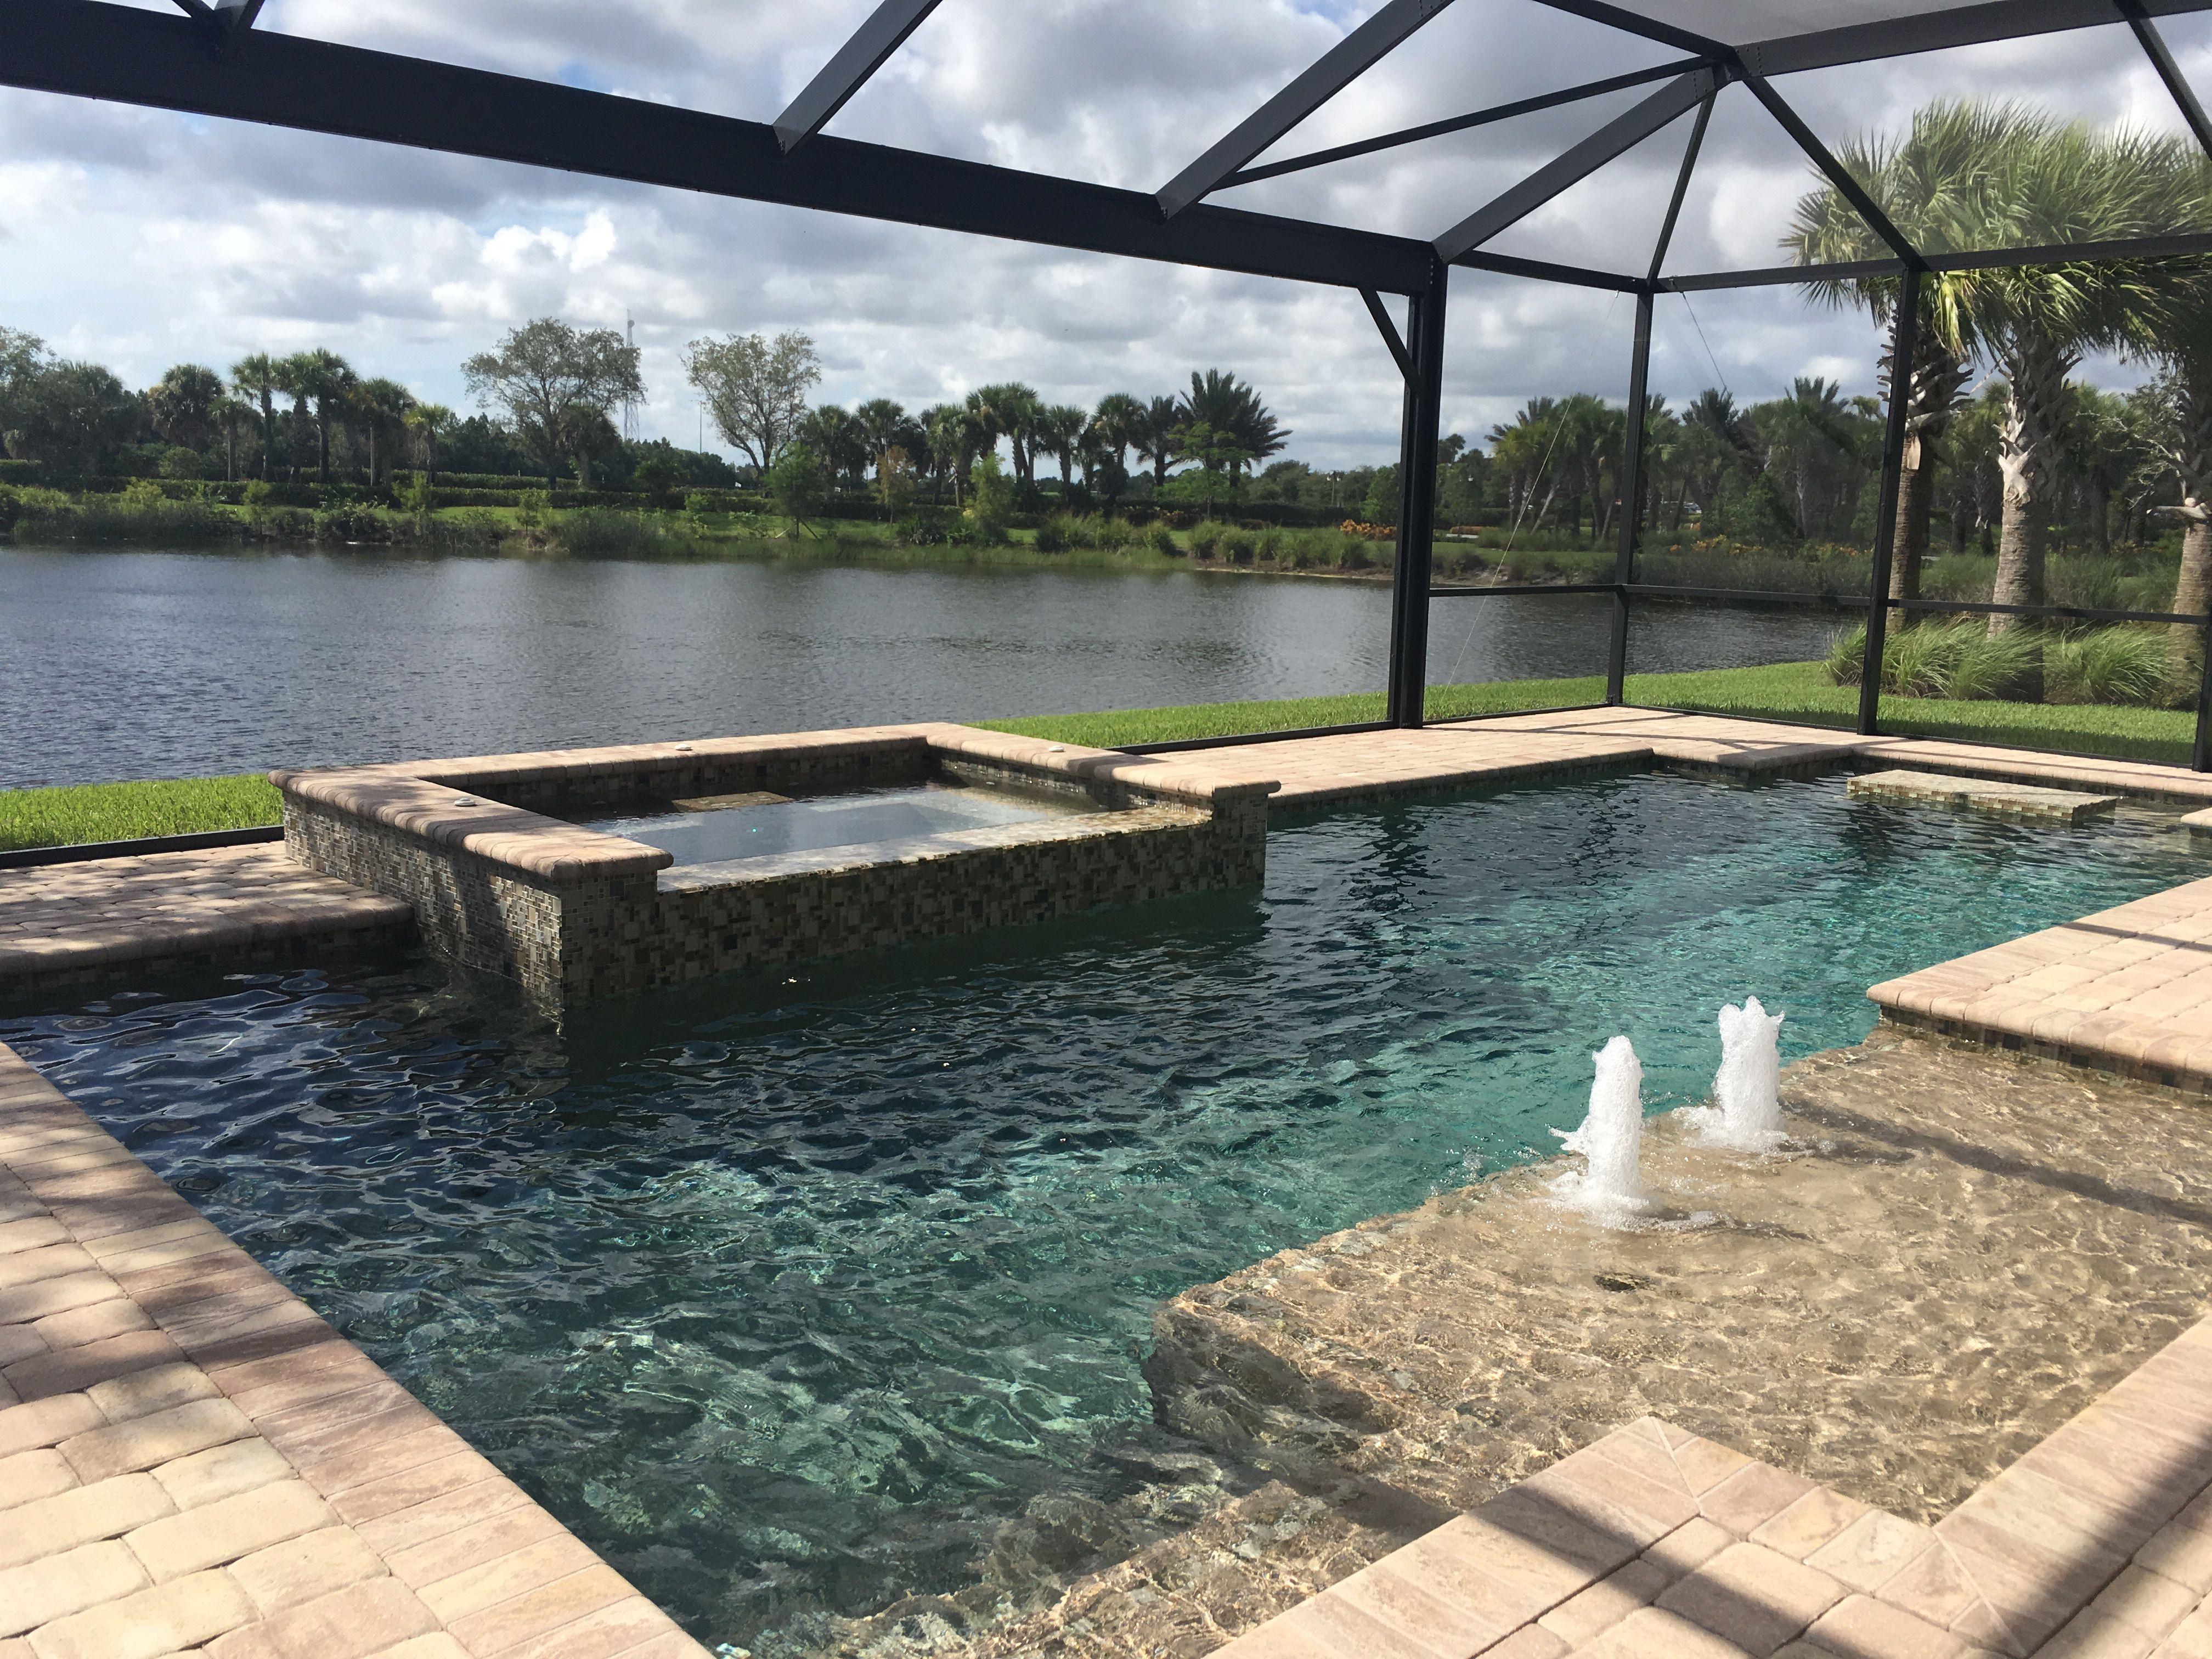 Pin By Jose Vitor On Swimming Pool Modern Pools Swimming Pool Designs Lake George Cabins